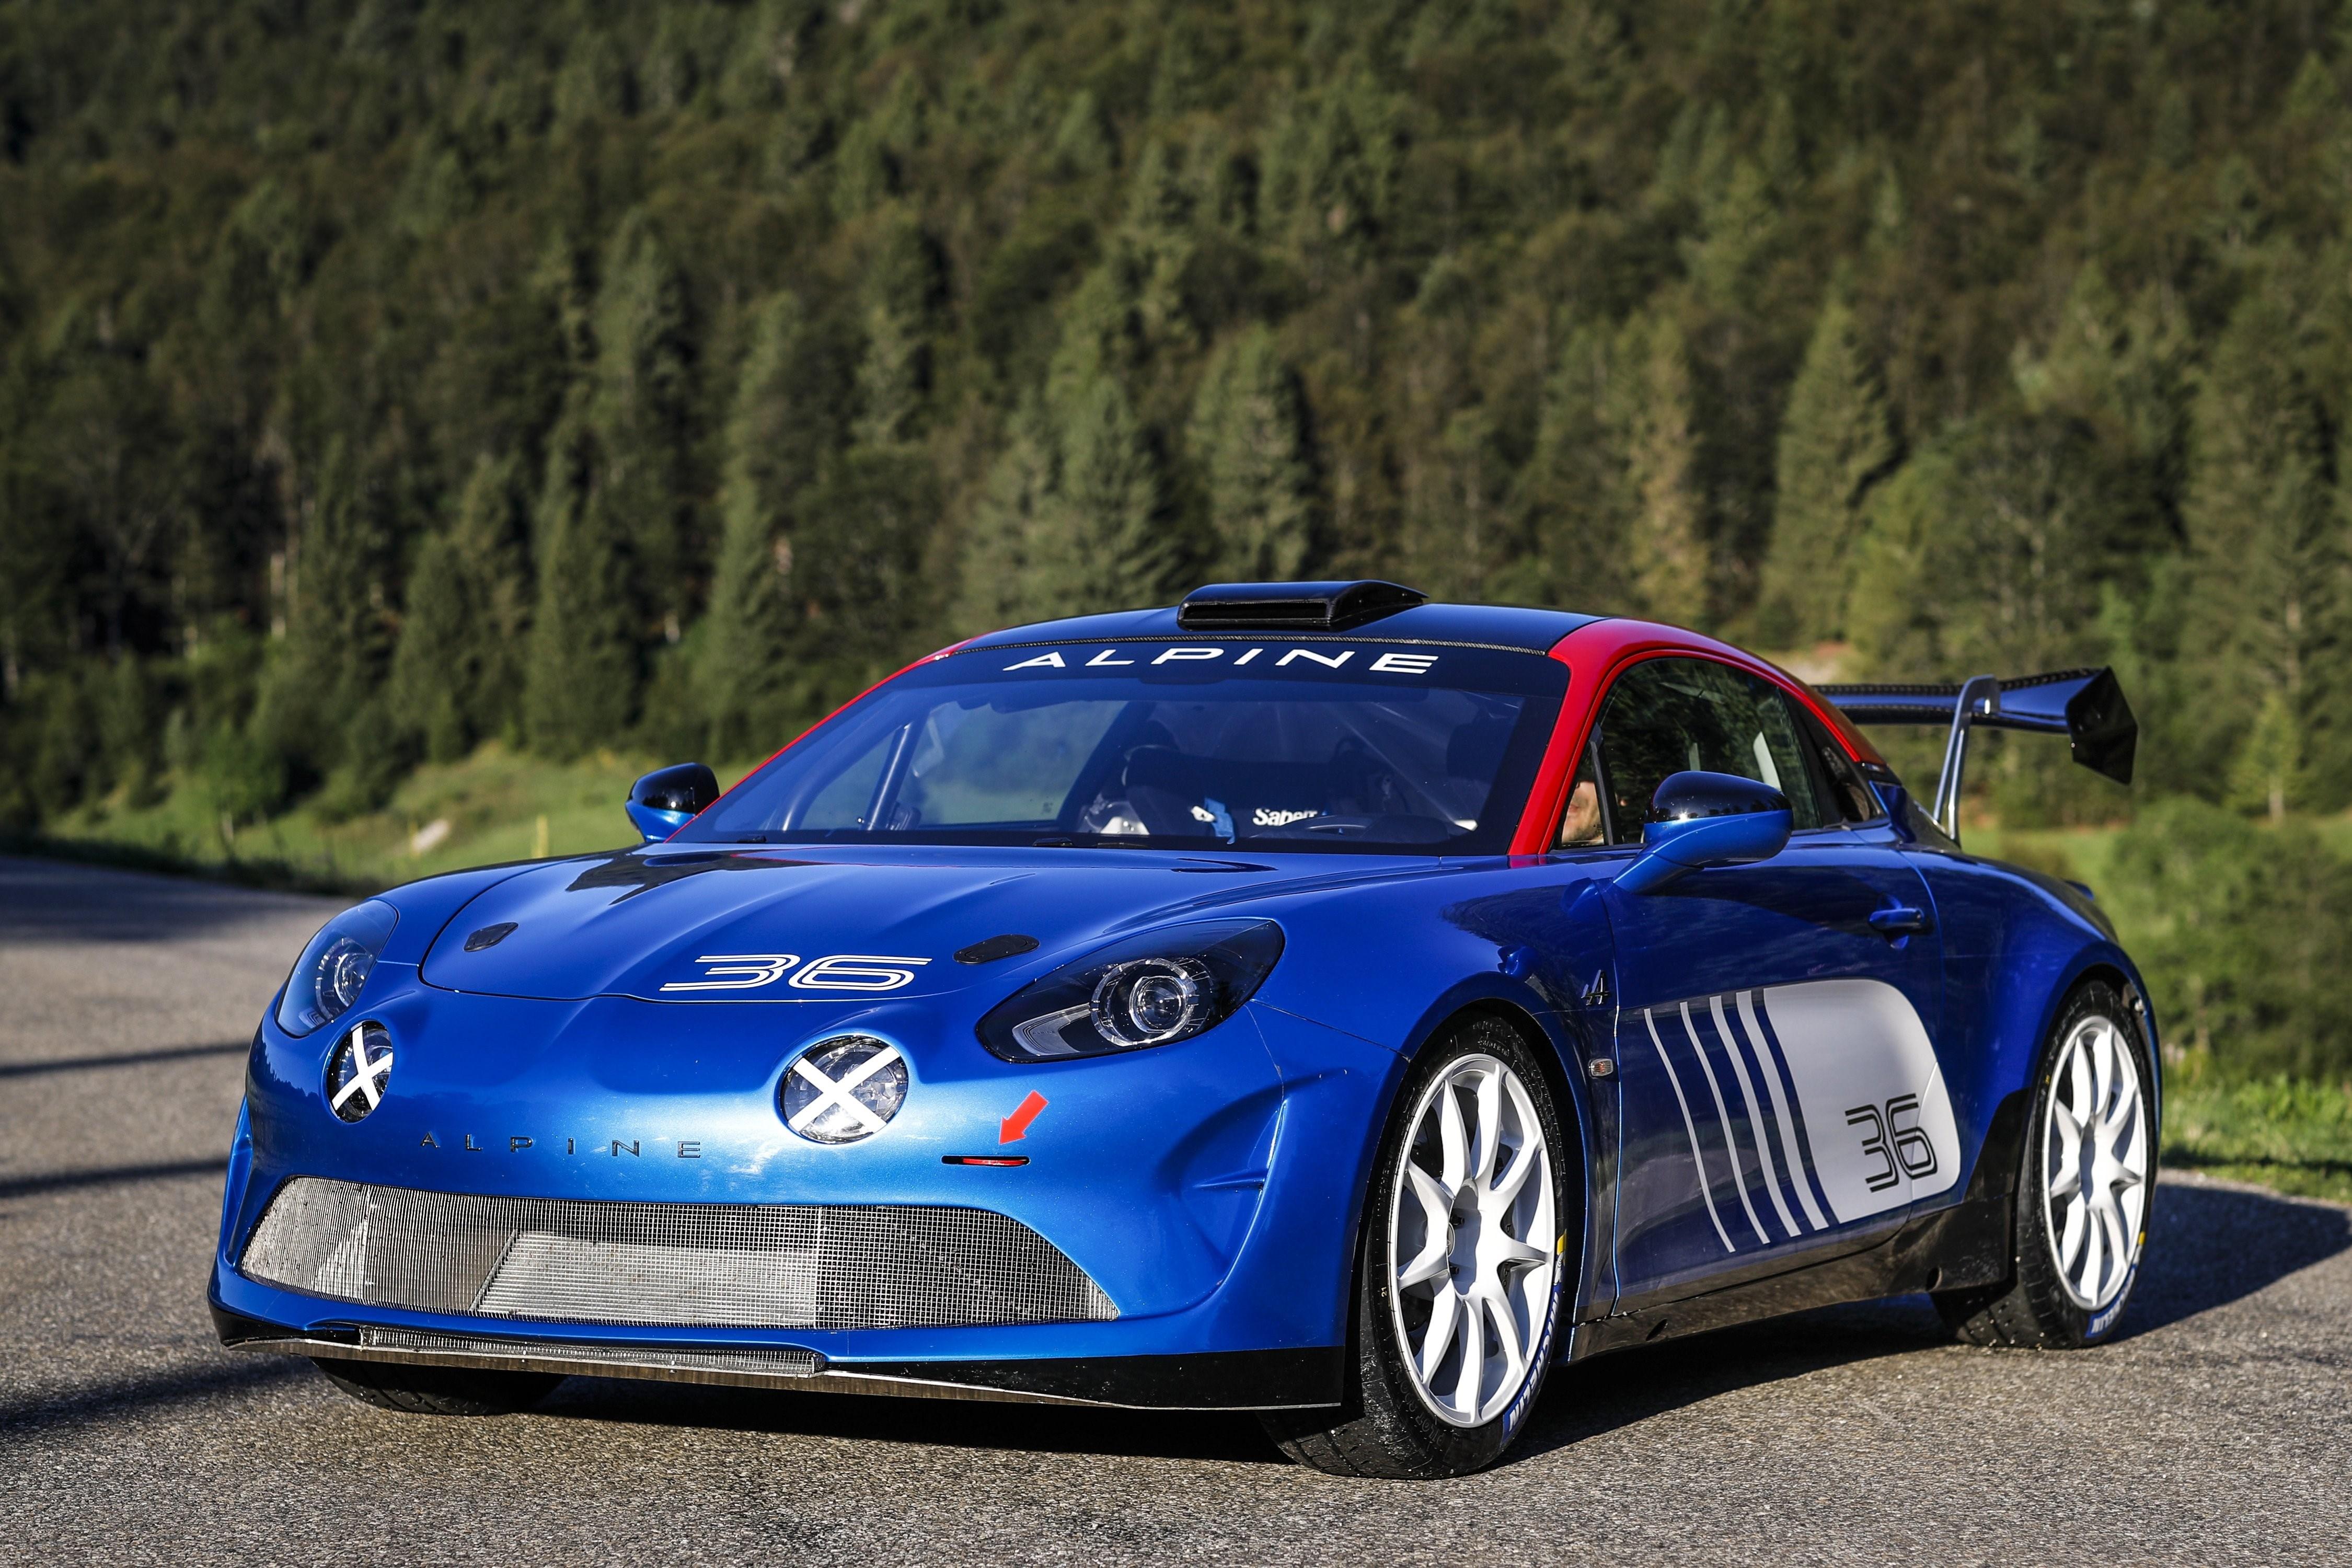 alpine a110 rally presentation officielle specs prix toutes les infos 26 | Alpine A110 RALLY Présentation officielle - Specs / prix ? toutes les infos !